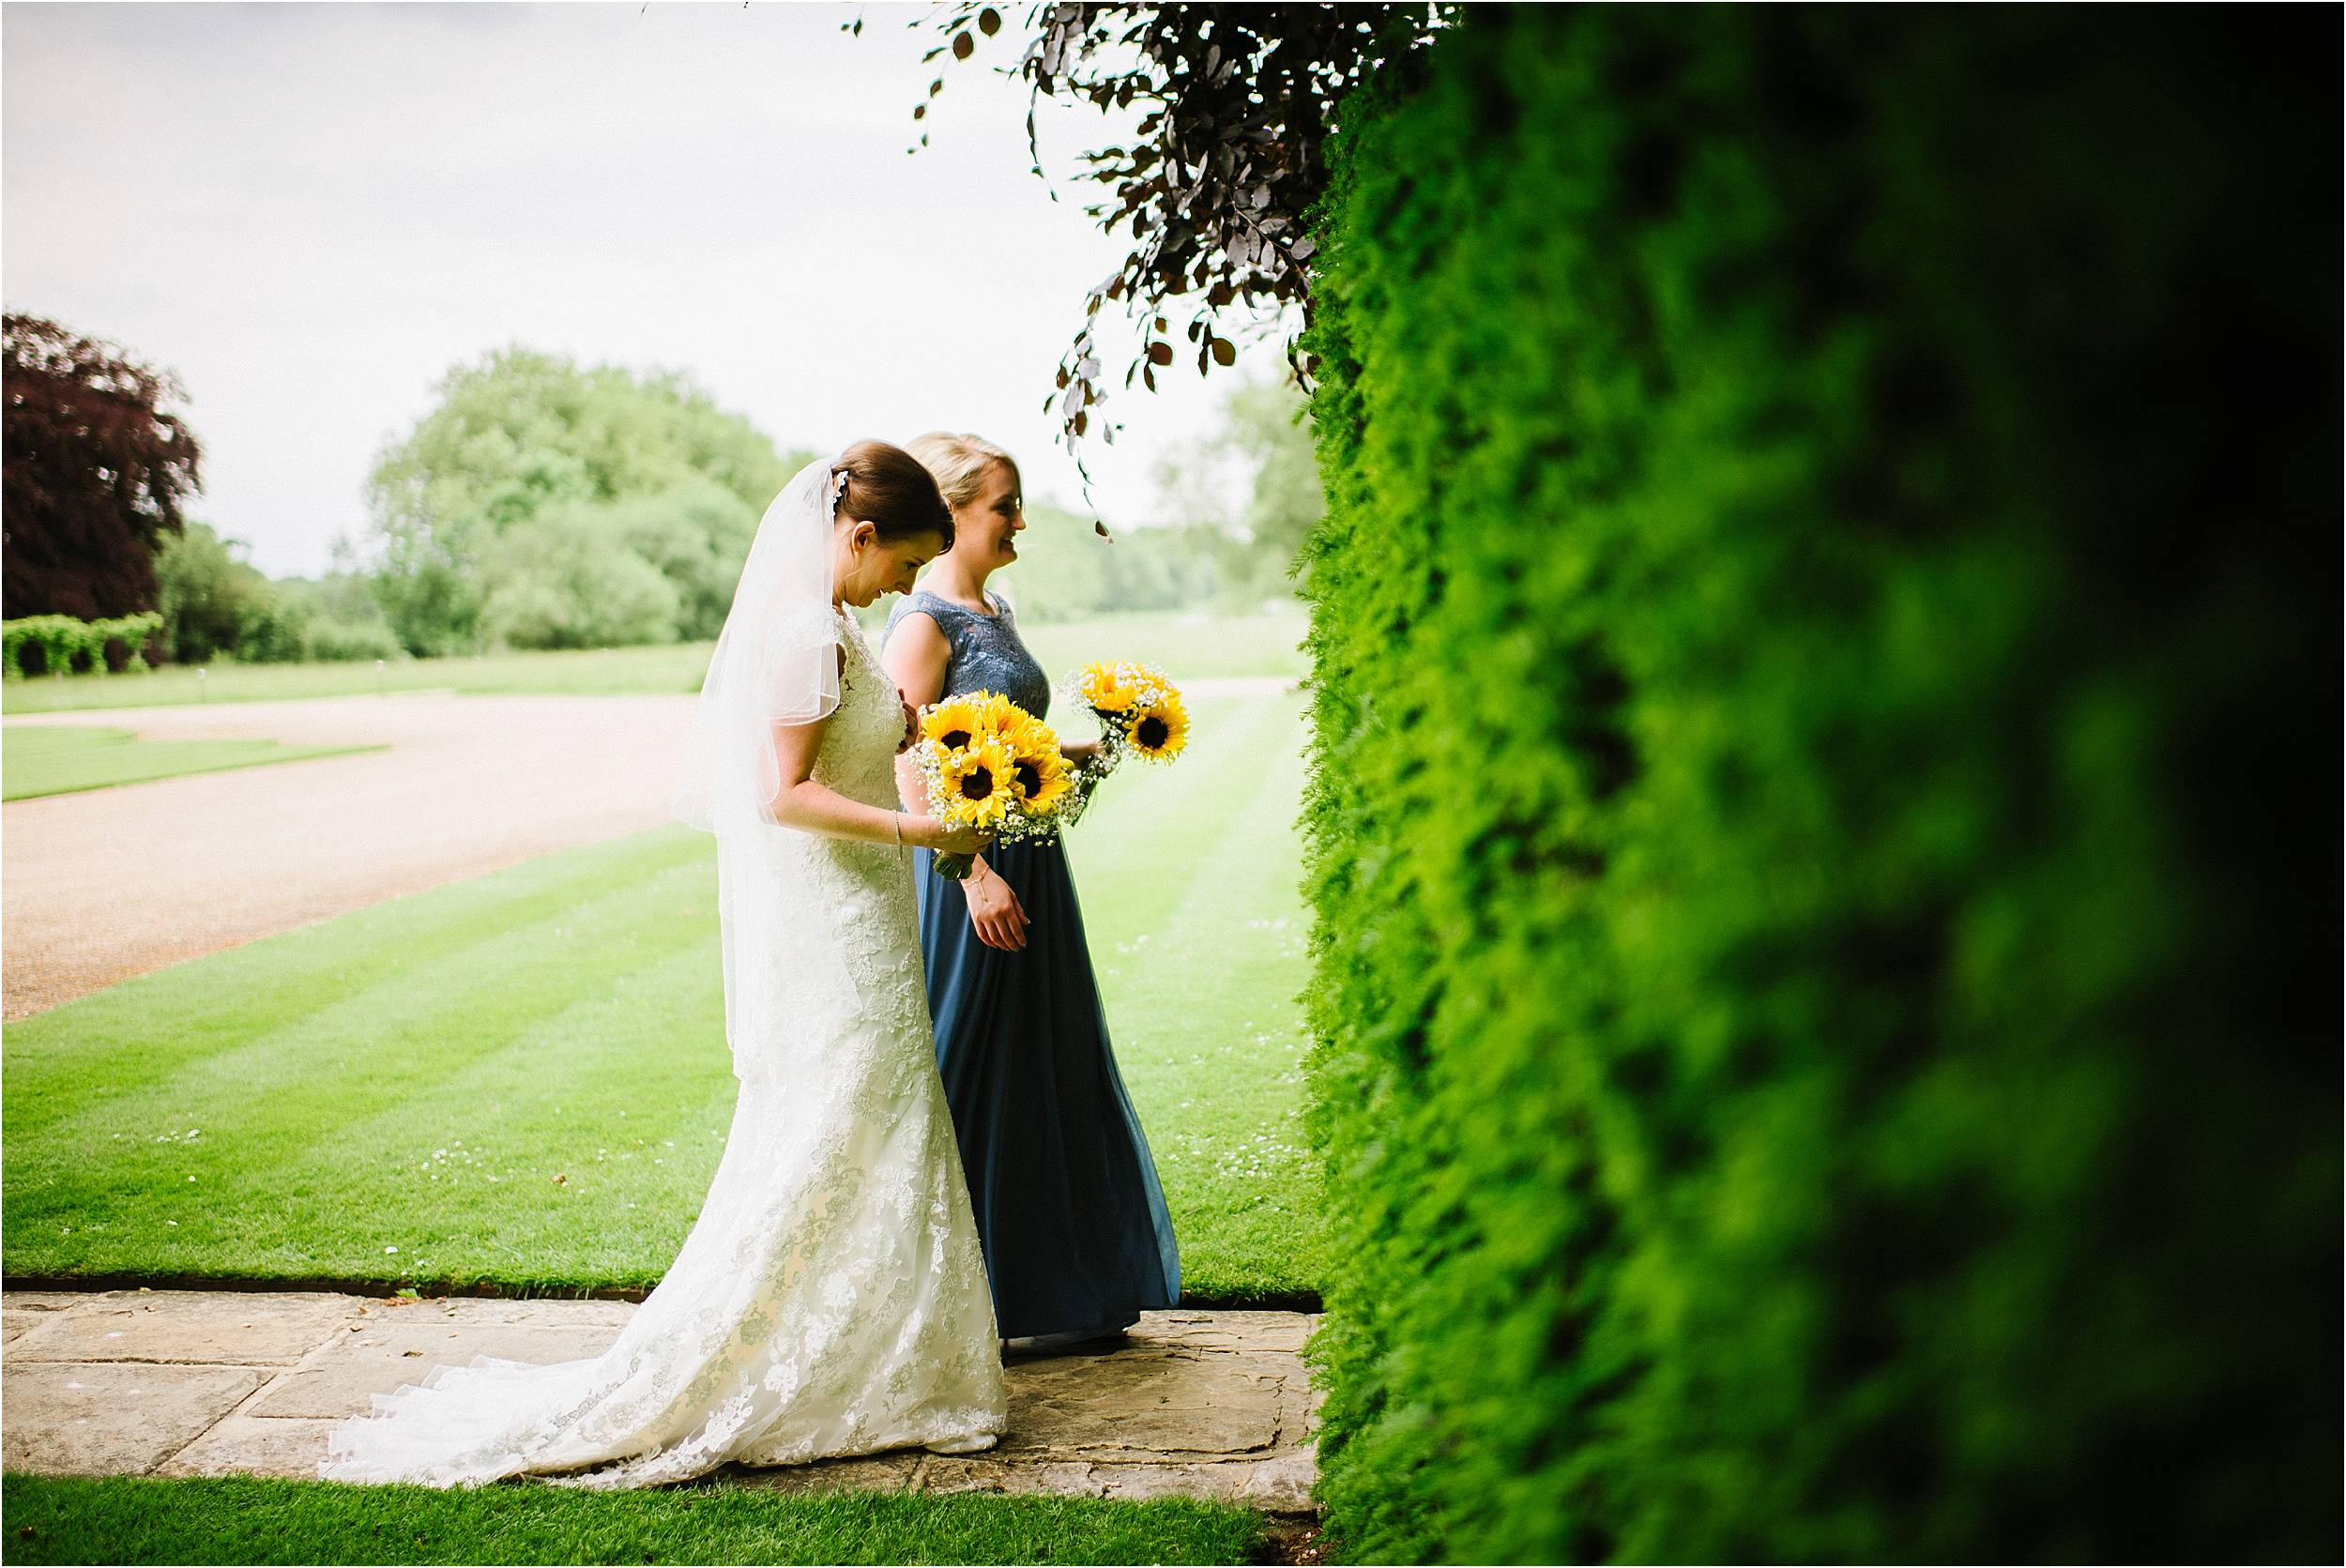 Hengrave Hall Wedding Photographer_0130.jpg